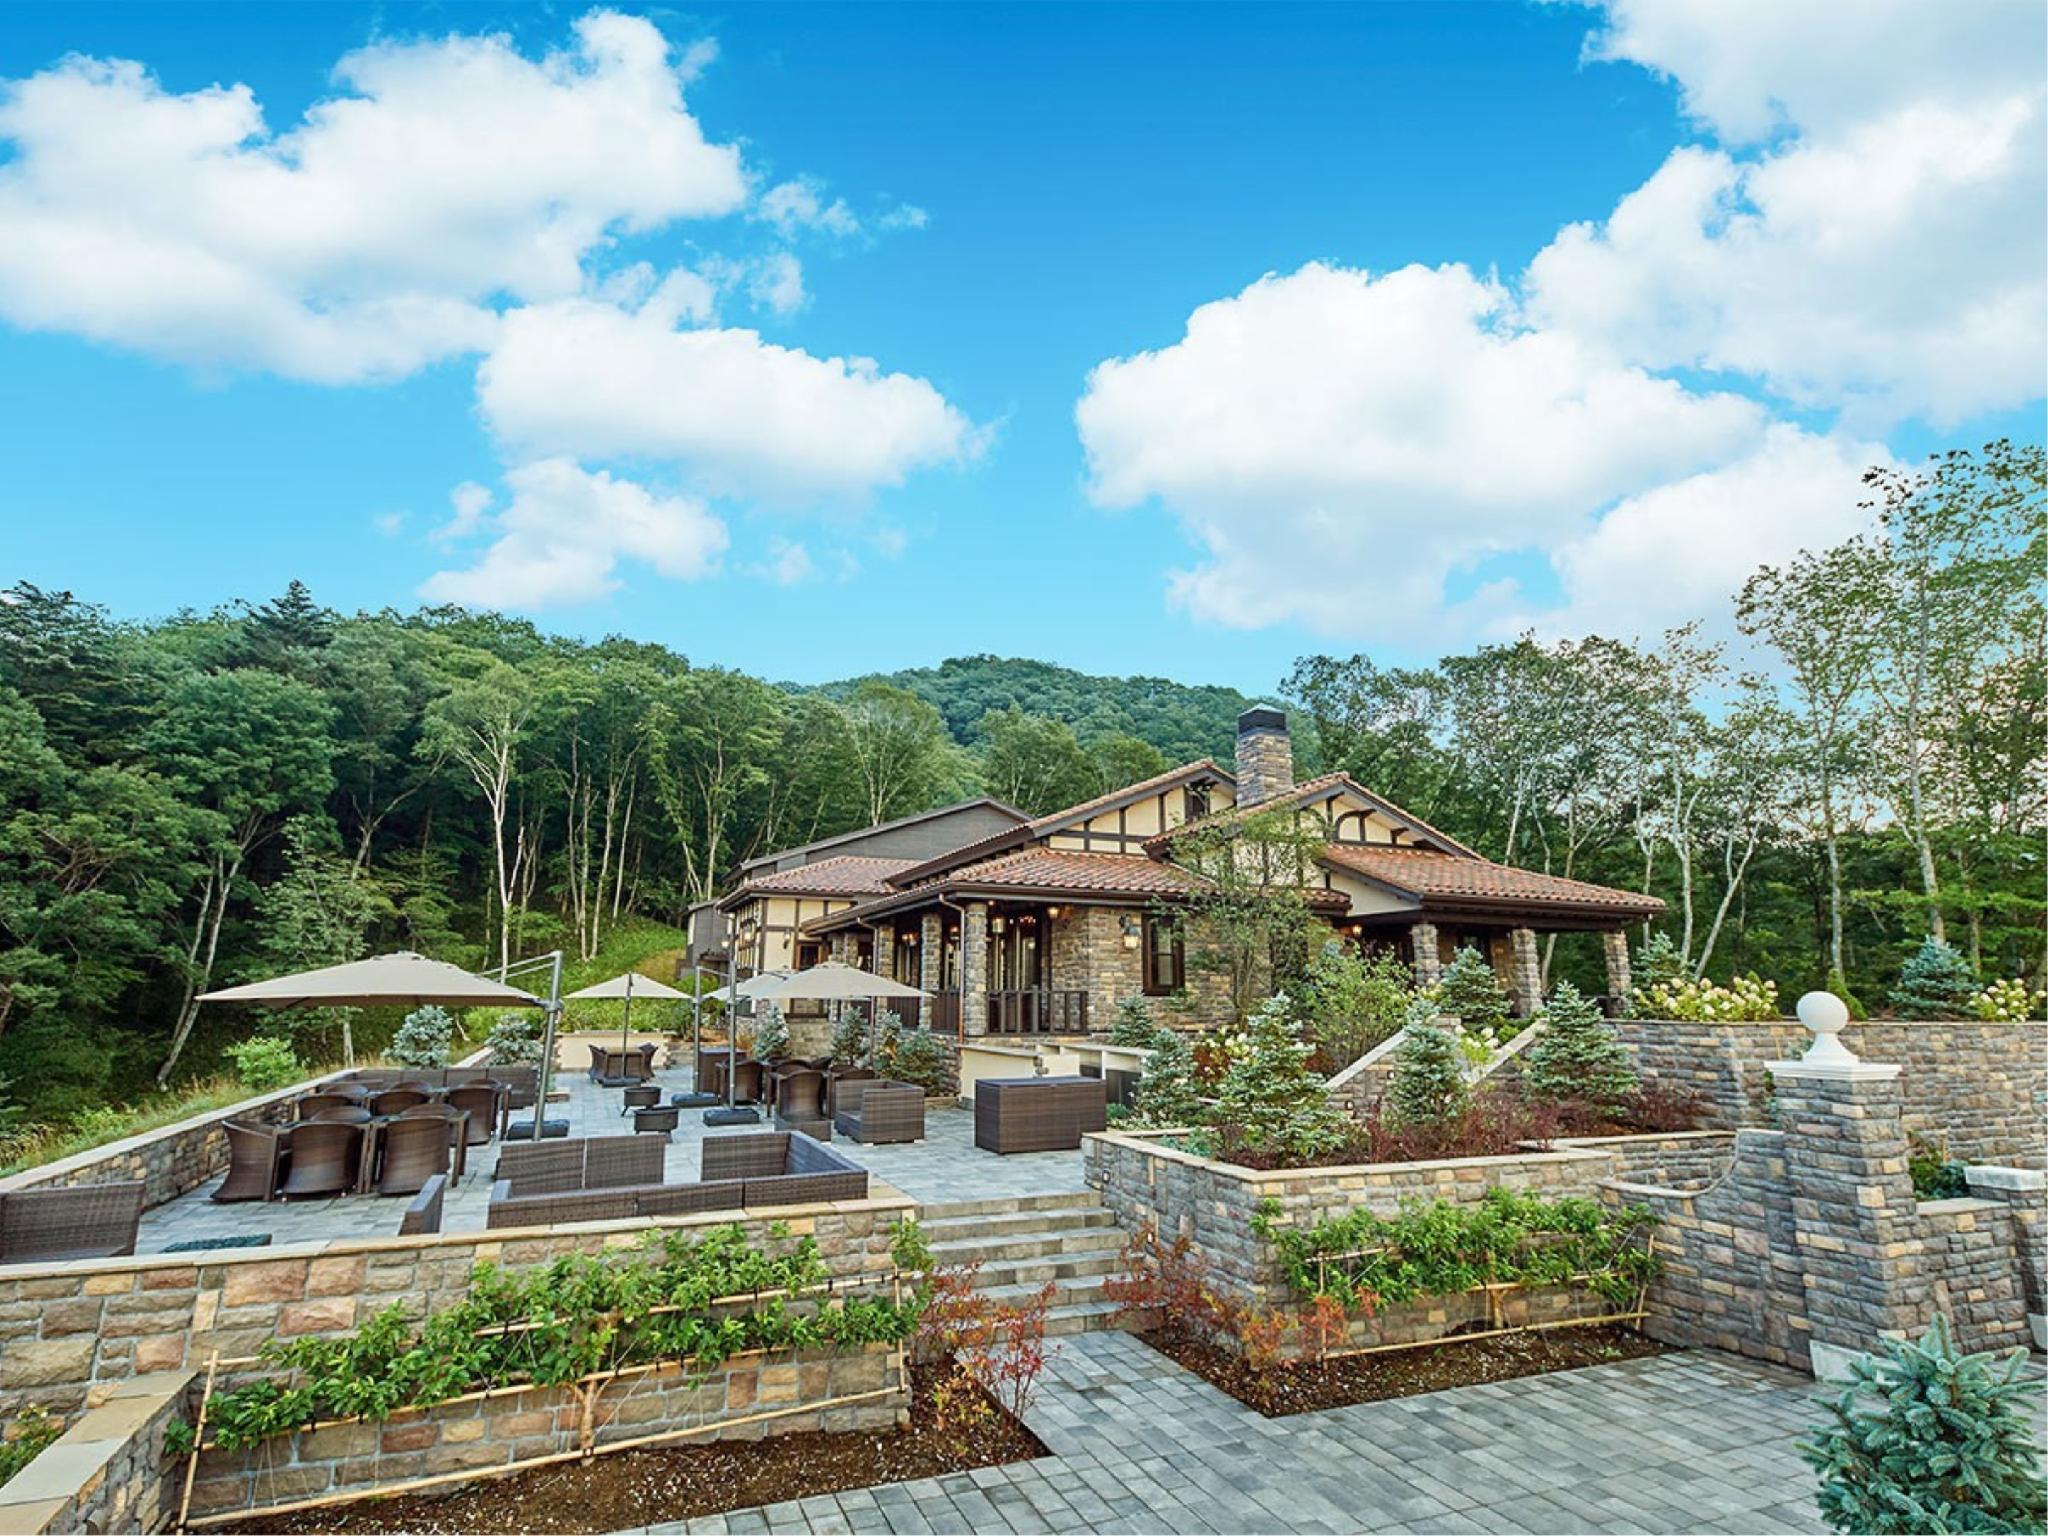 Legrand Karuizawa Hotel & Resort